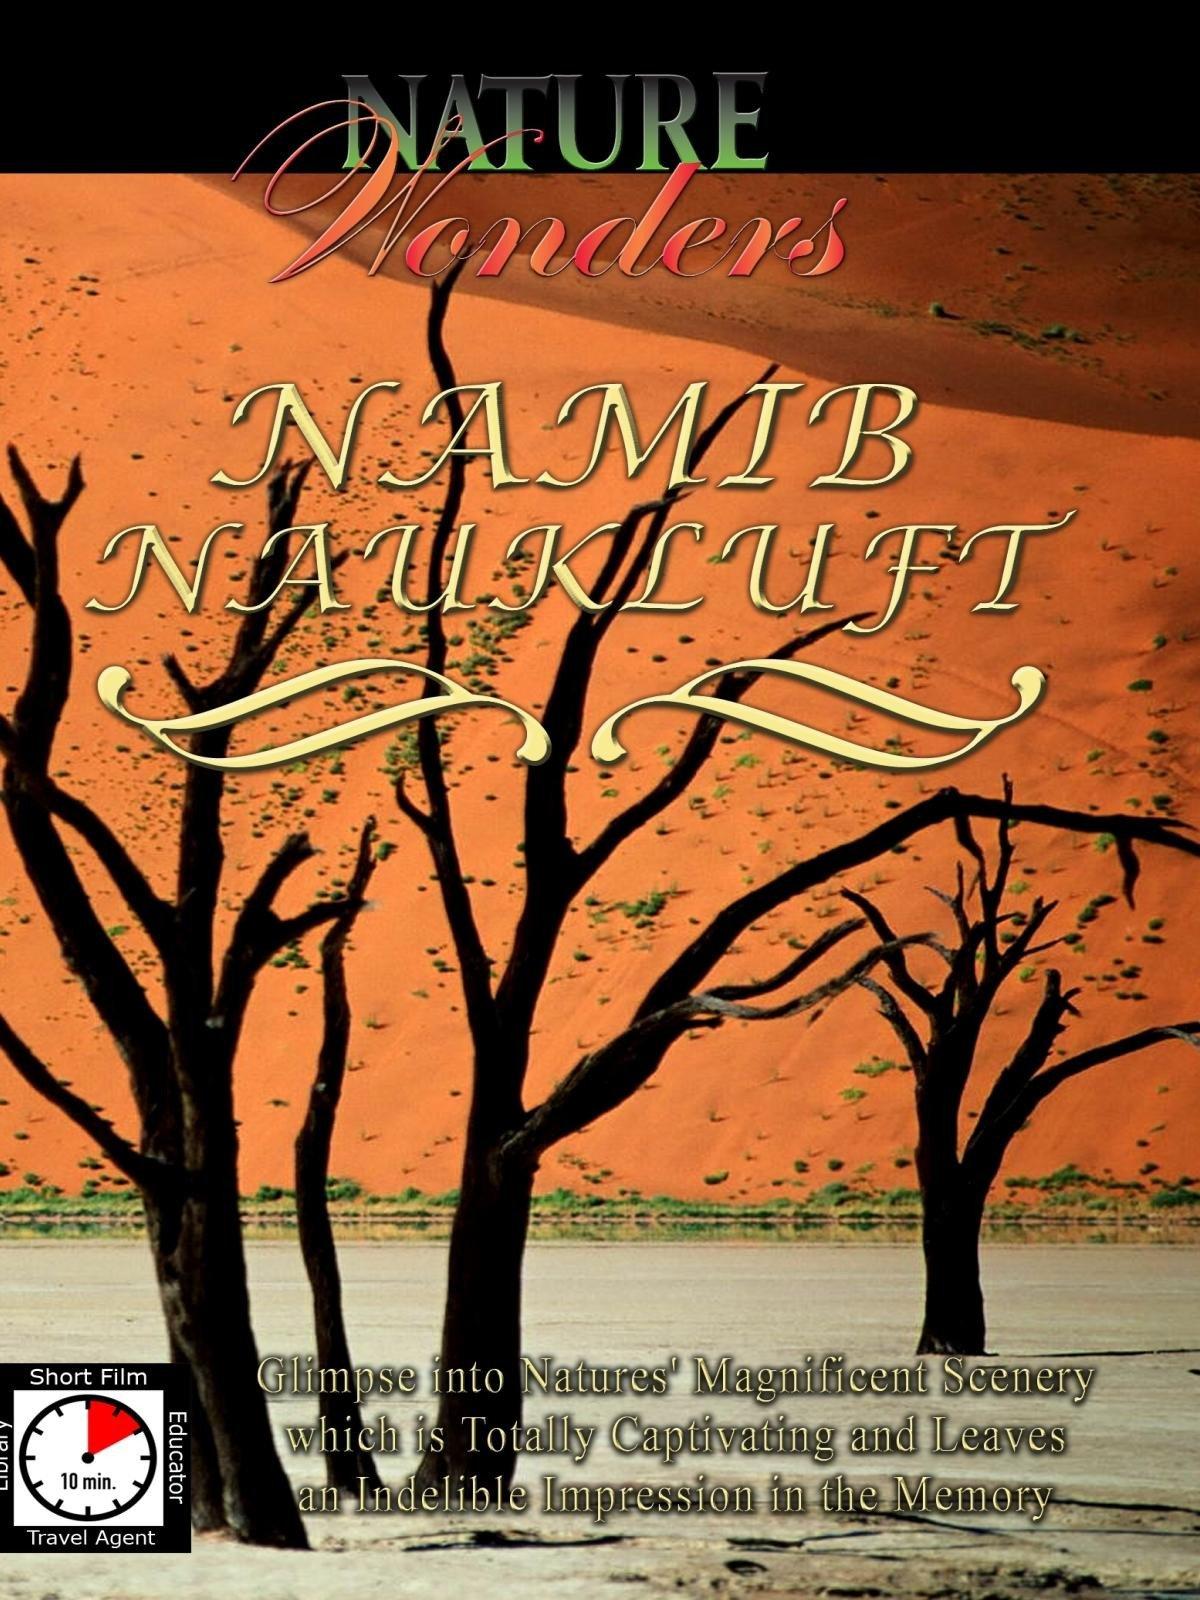 Nature Wonders - Namib Naukluft - Namibia